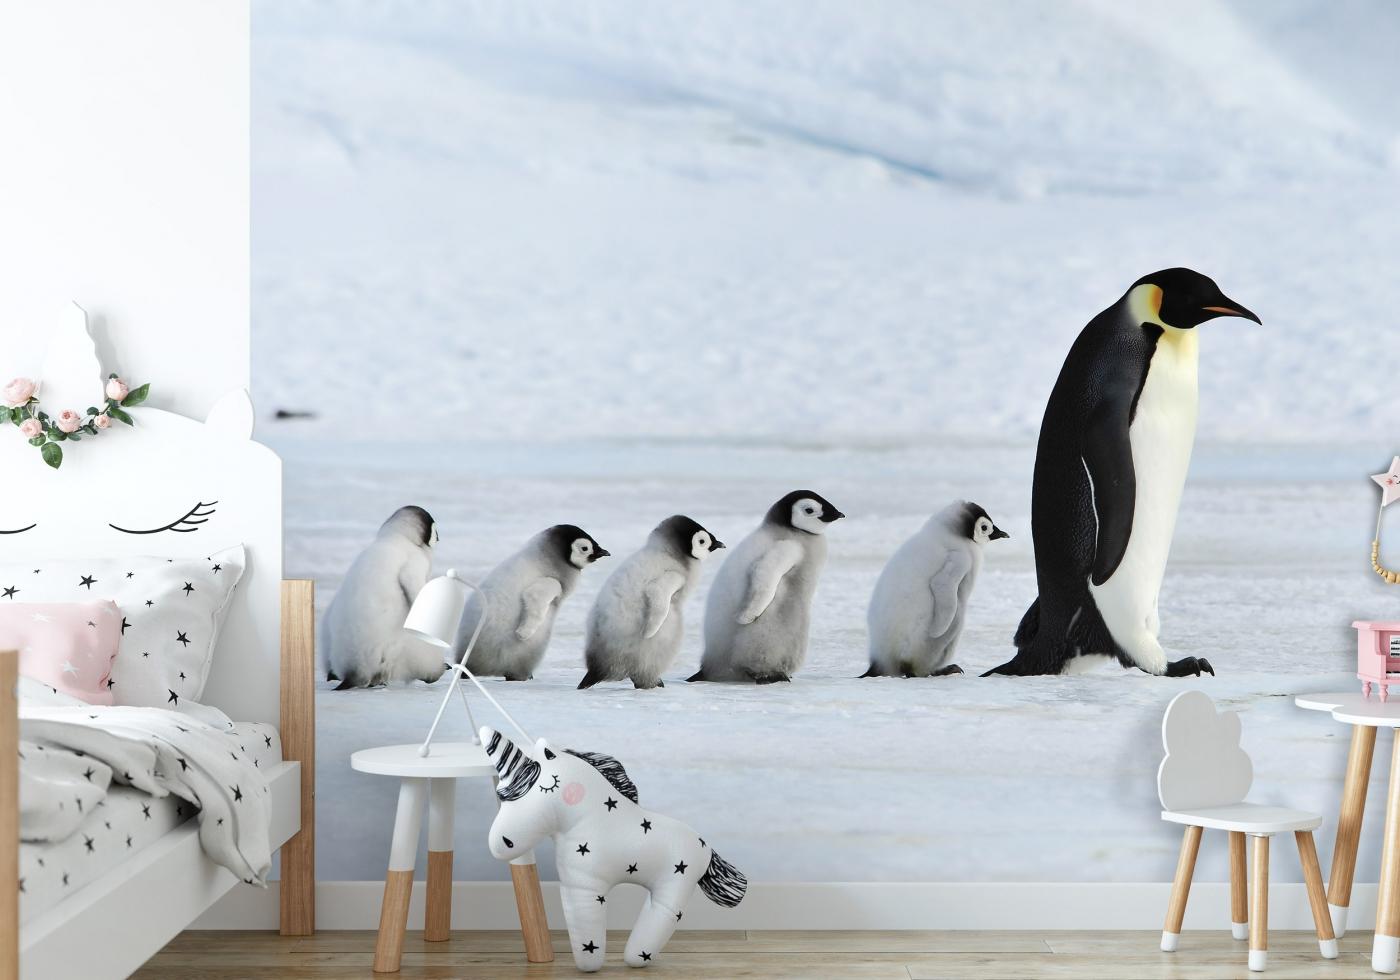 Tapeta Rodina tučňáků, 504 x 310 cm